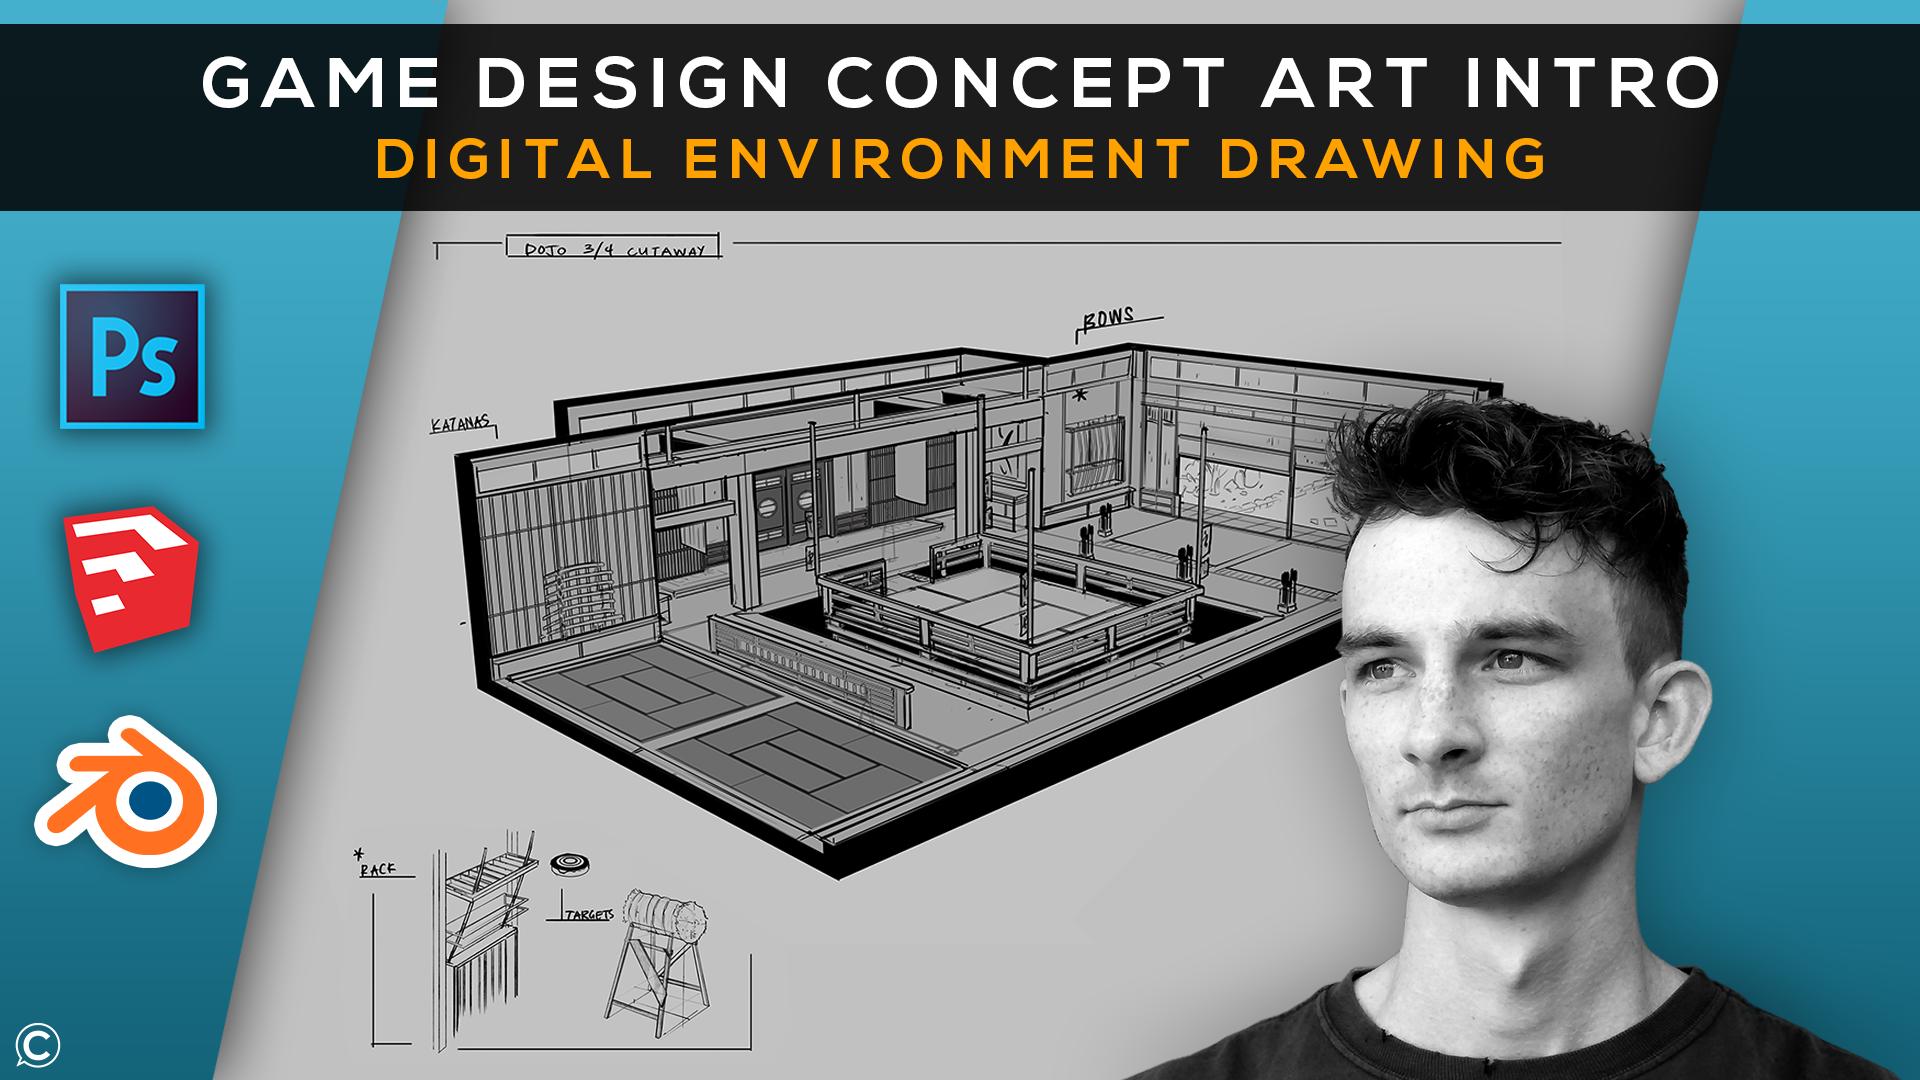 Game Design Concept Art Intro: Digital Environment Drawing